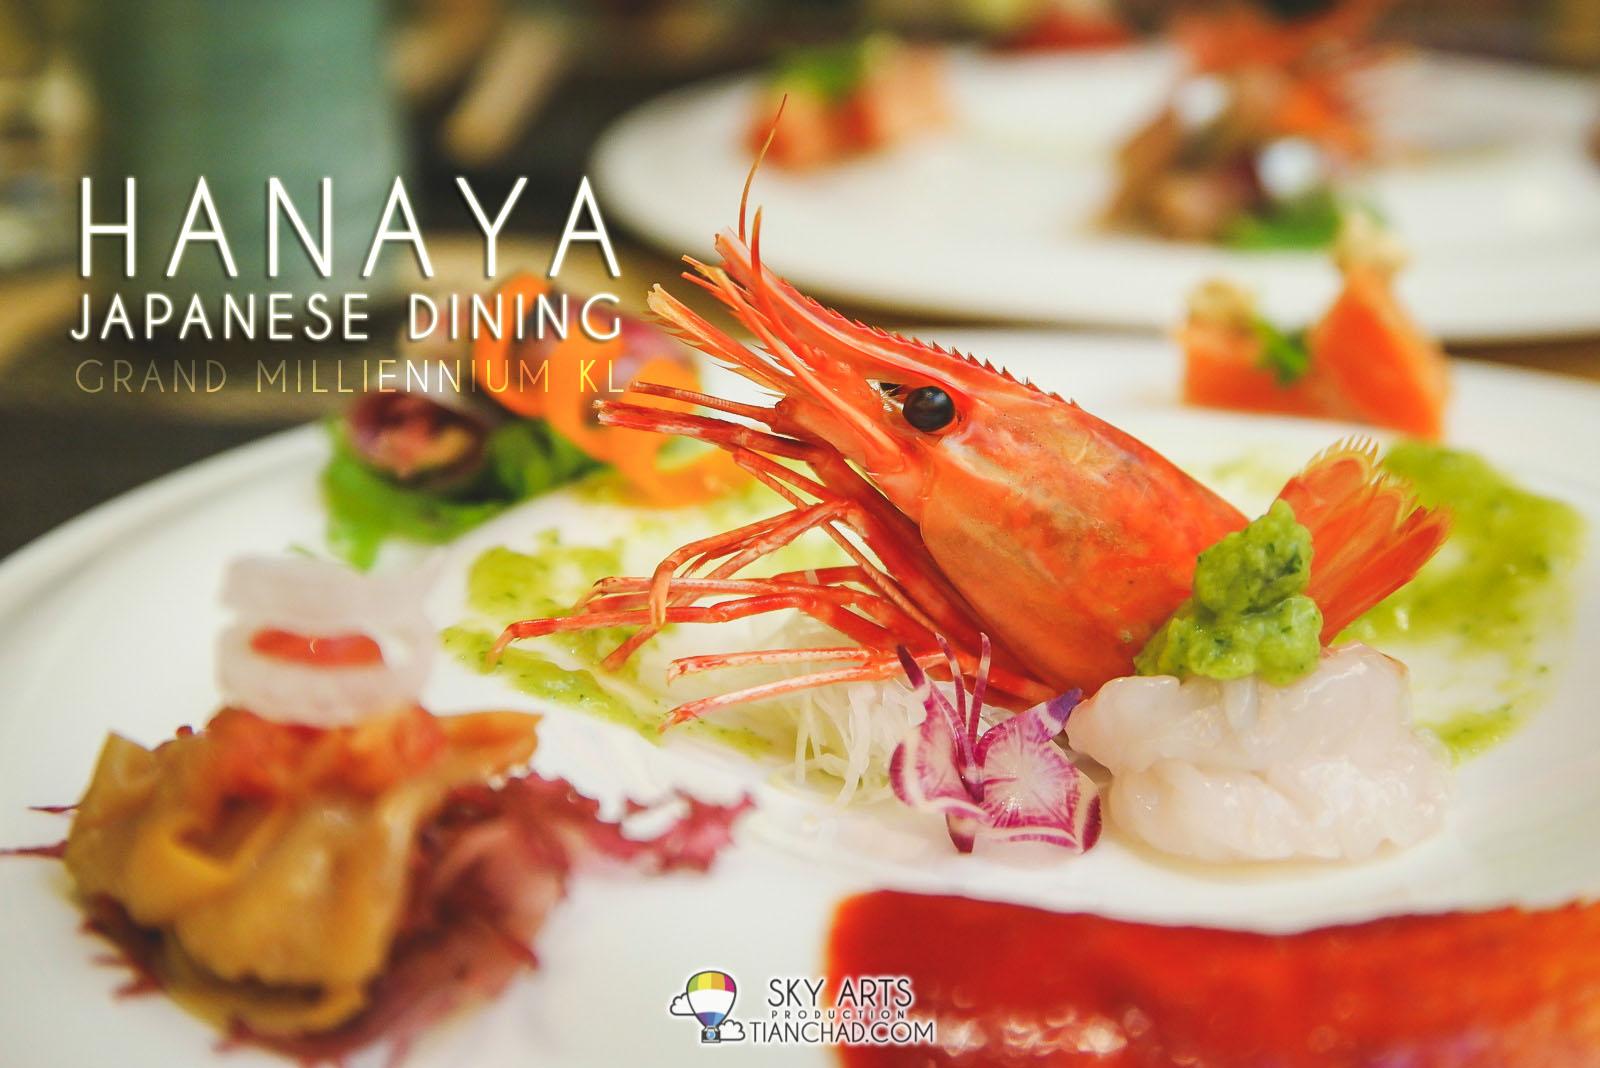 HANAYA Japanese Dining @ Grand Millenium Kuala Lumpur